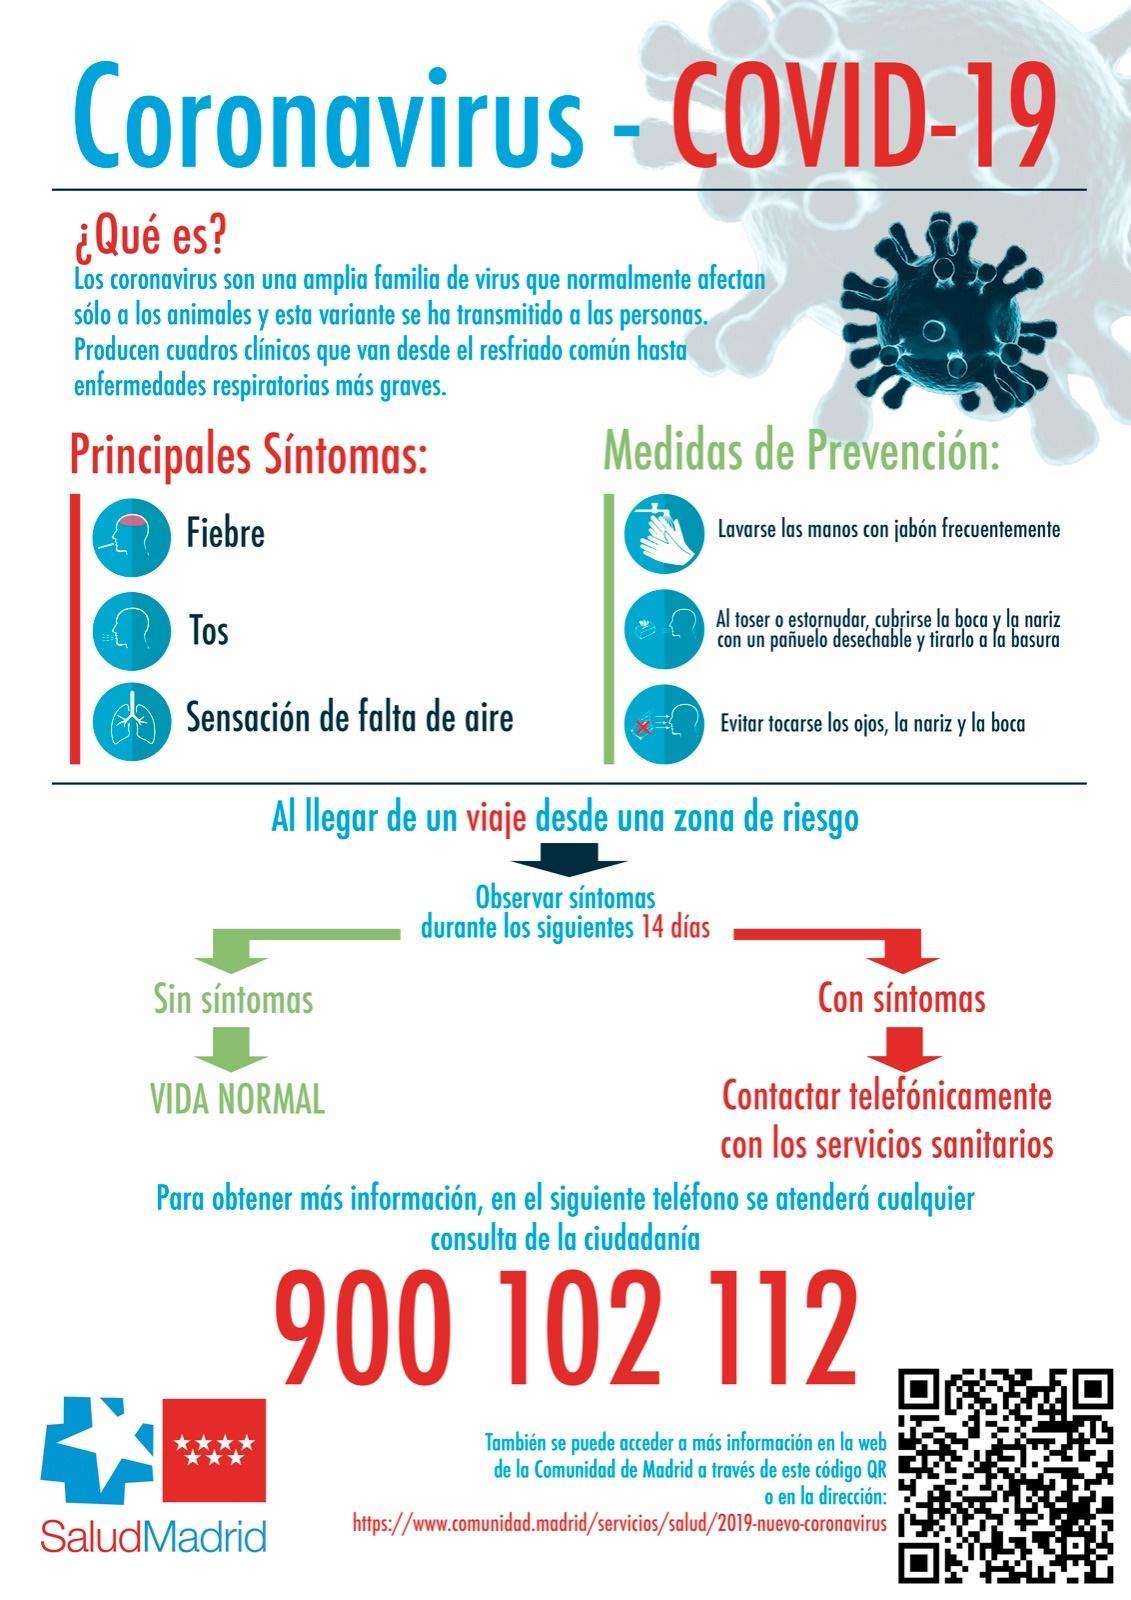 Coronavirus - Medidas de Prevención